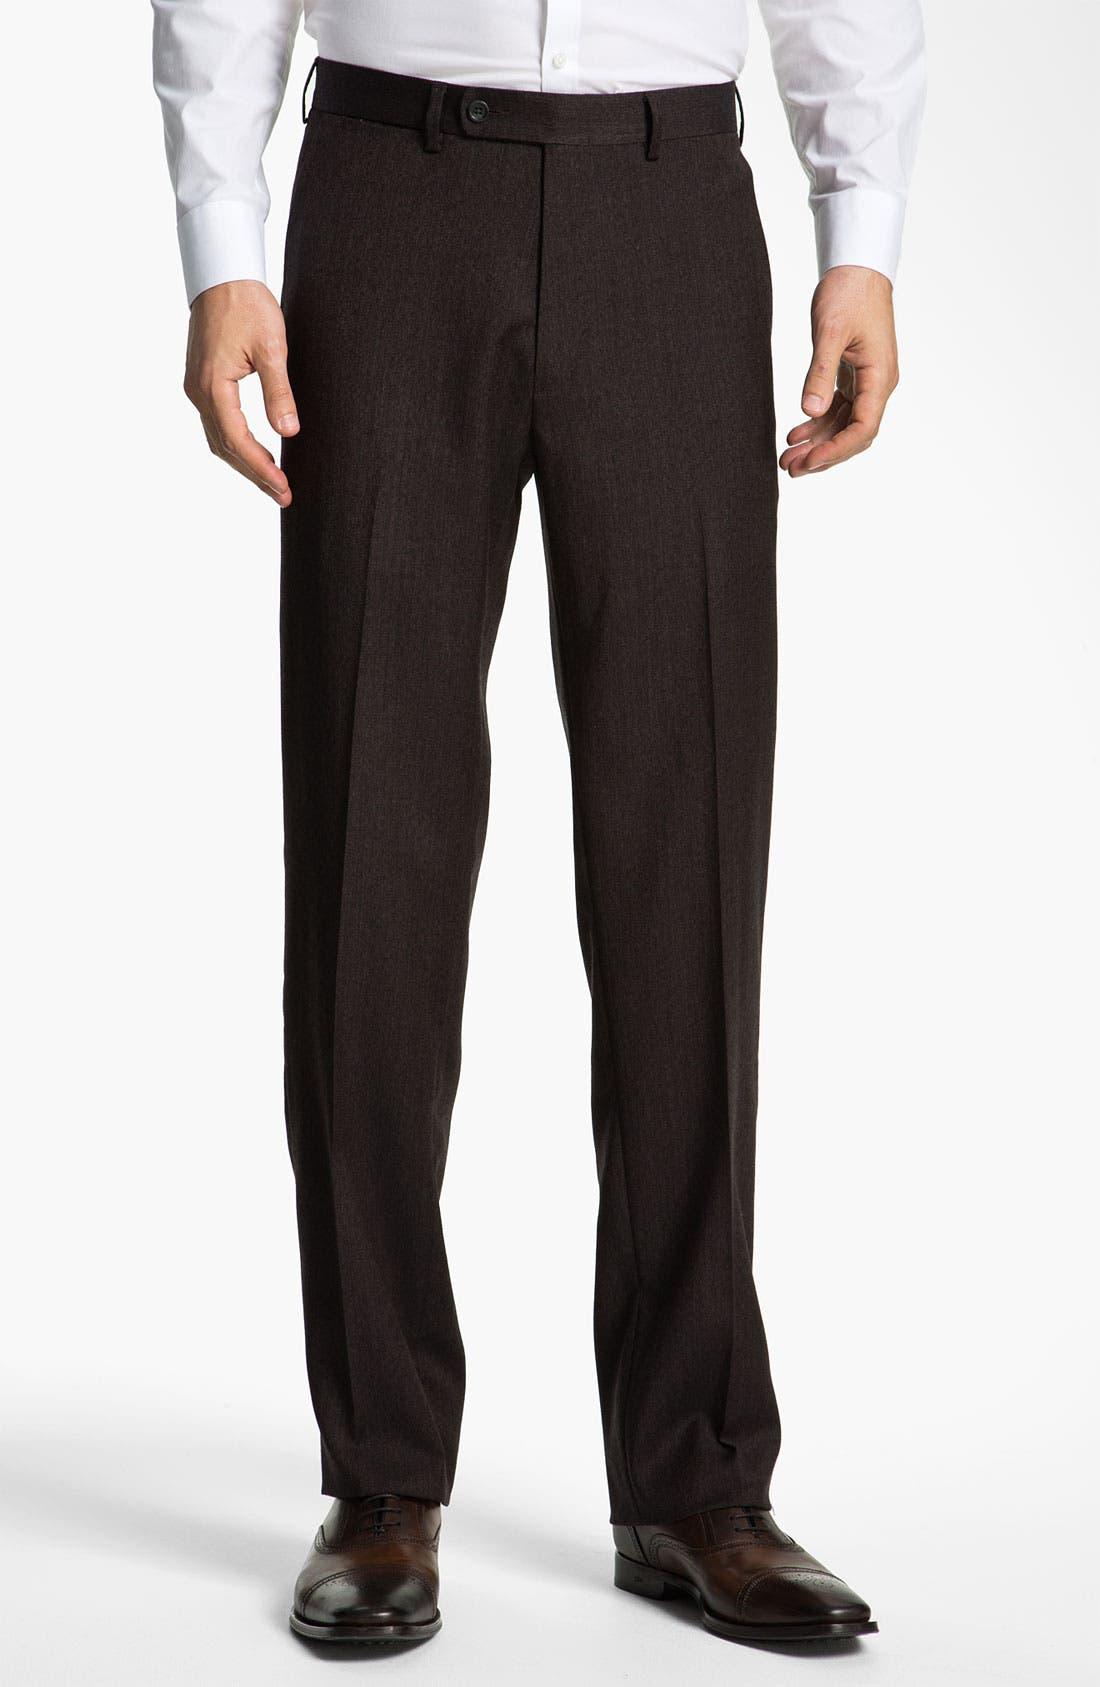 Alternate Image 1 Selected - Peter Millar 'Hi Low' Flat Front Wool Trousers